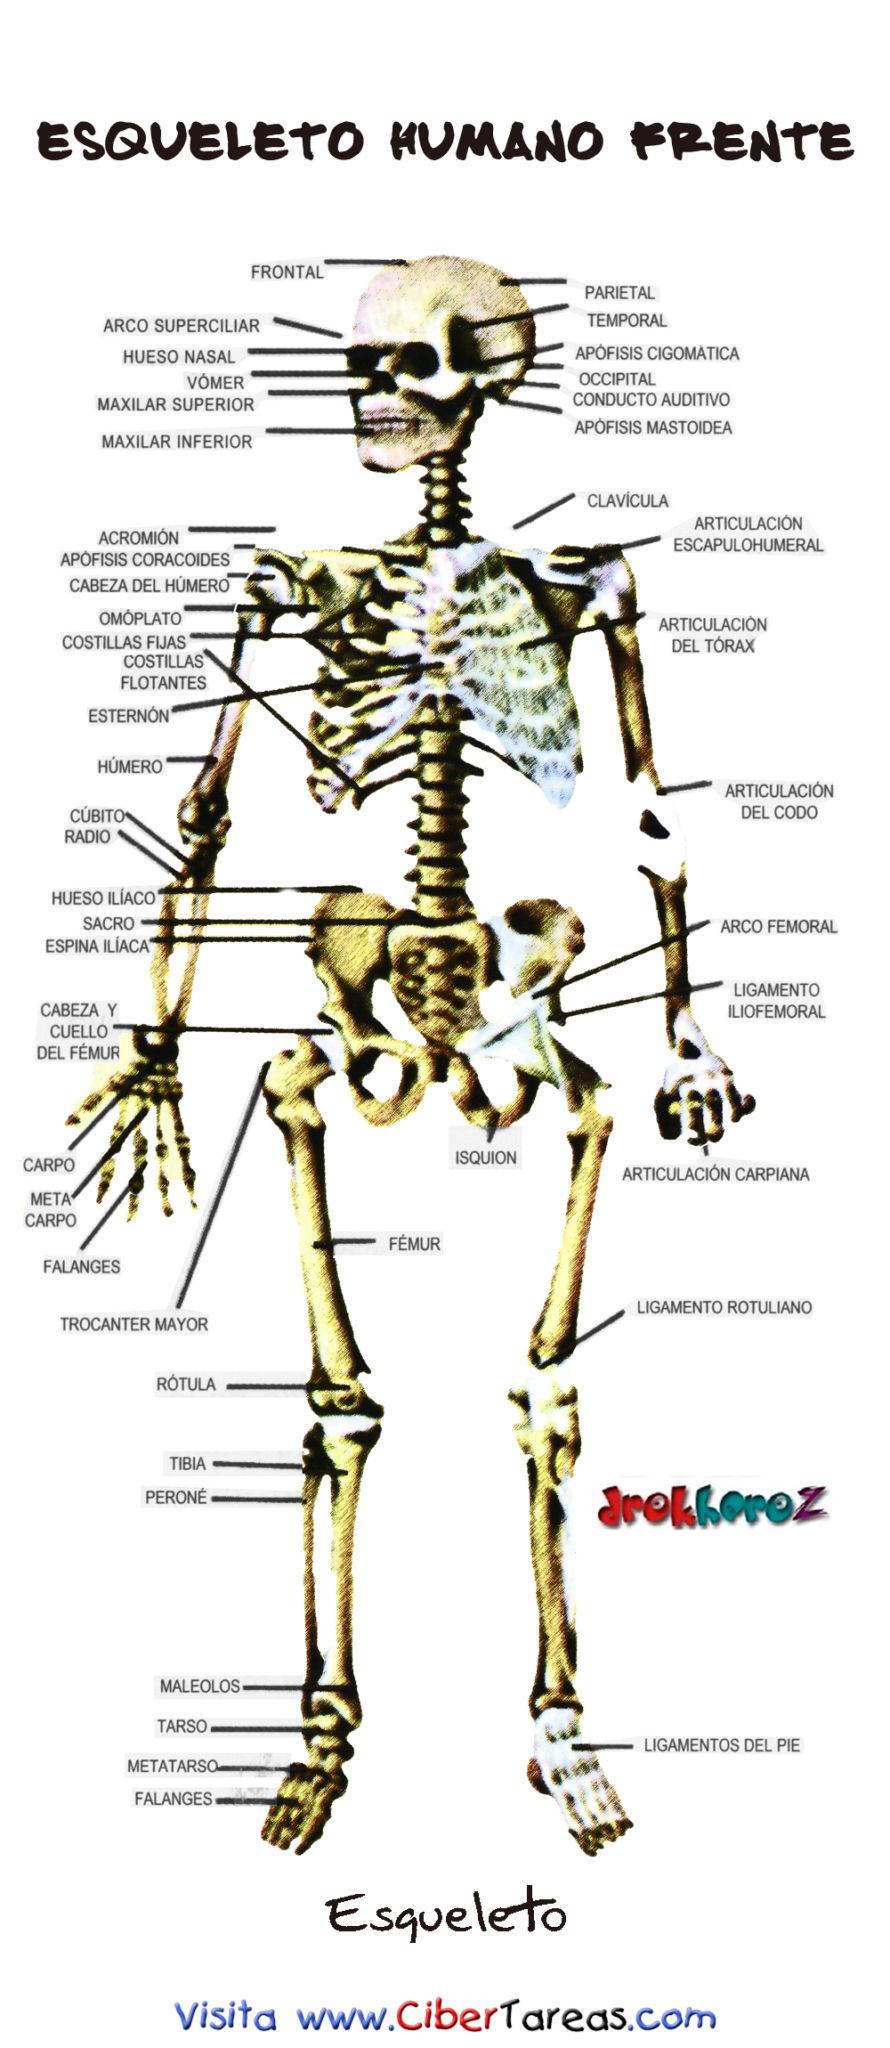 Esqueleto Humano Frente | CiberTareas